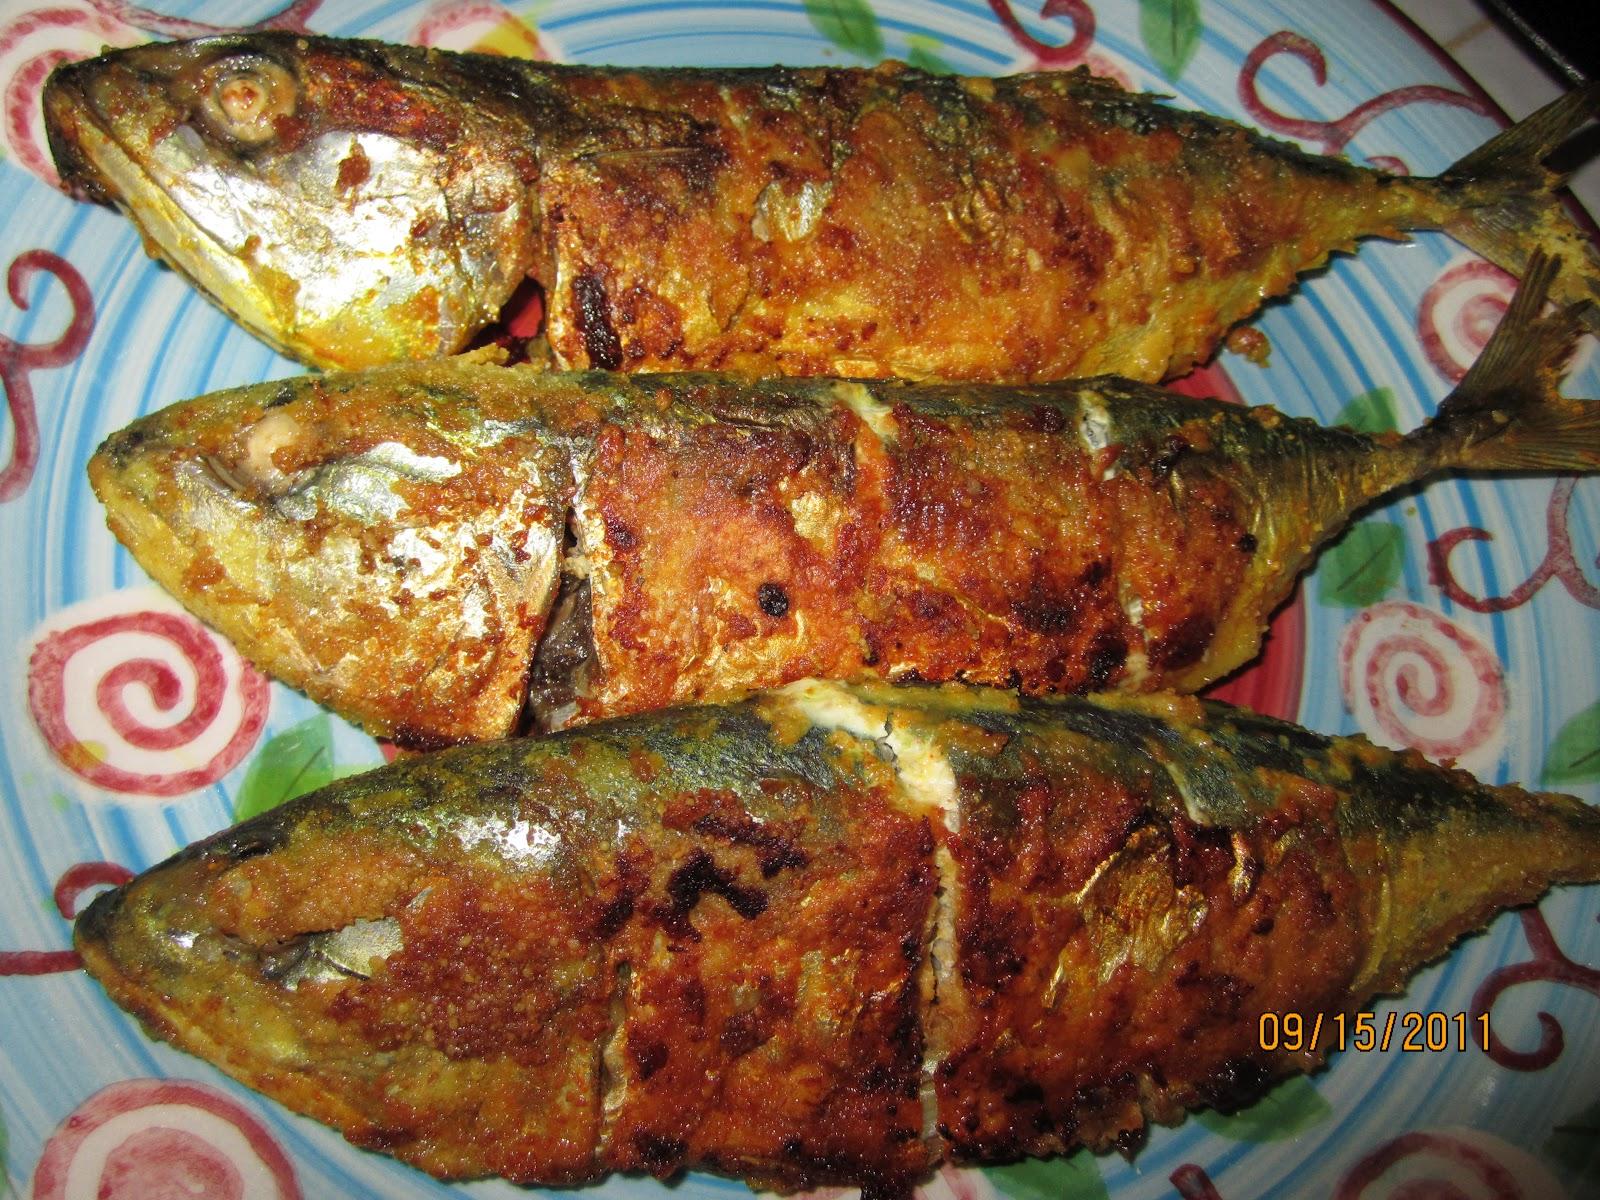 Indianfoodbazaar: Mum's Spicy Mackerel(Bangada) Fish Fry